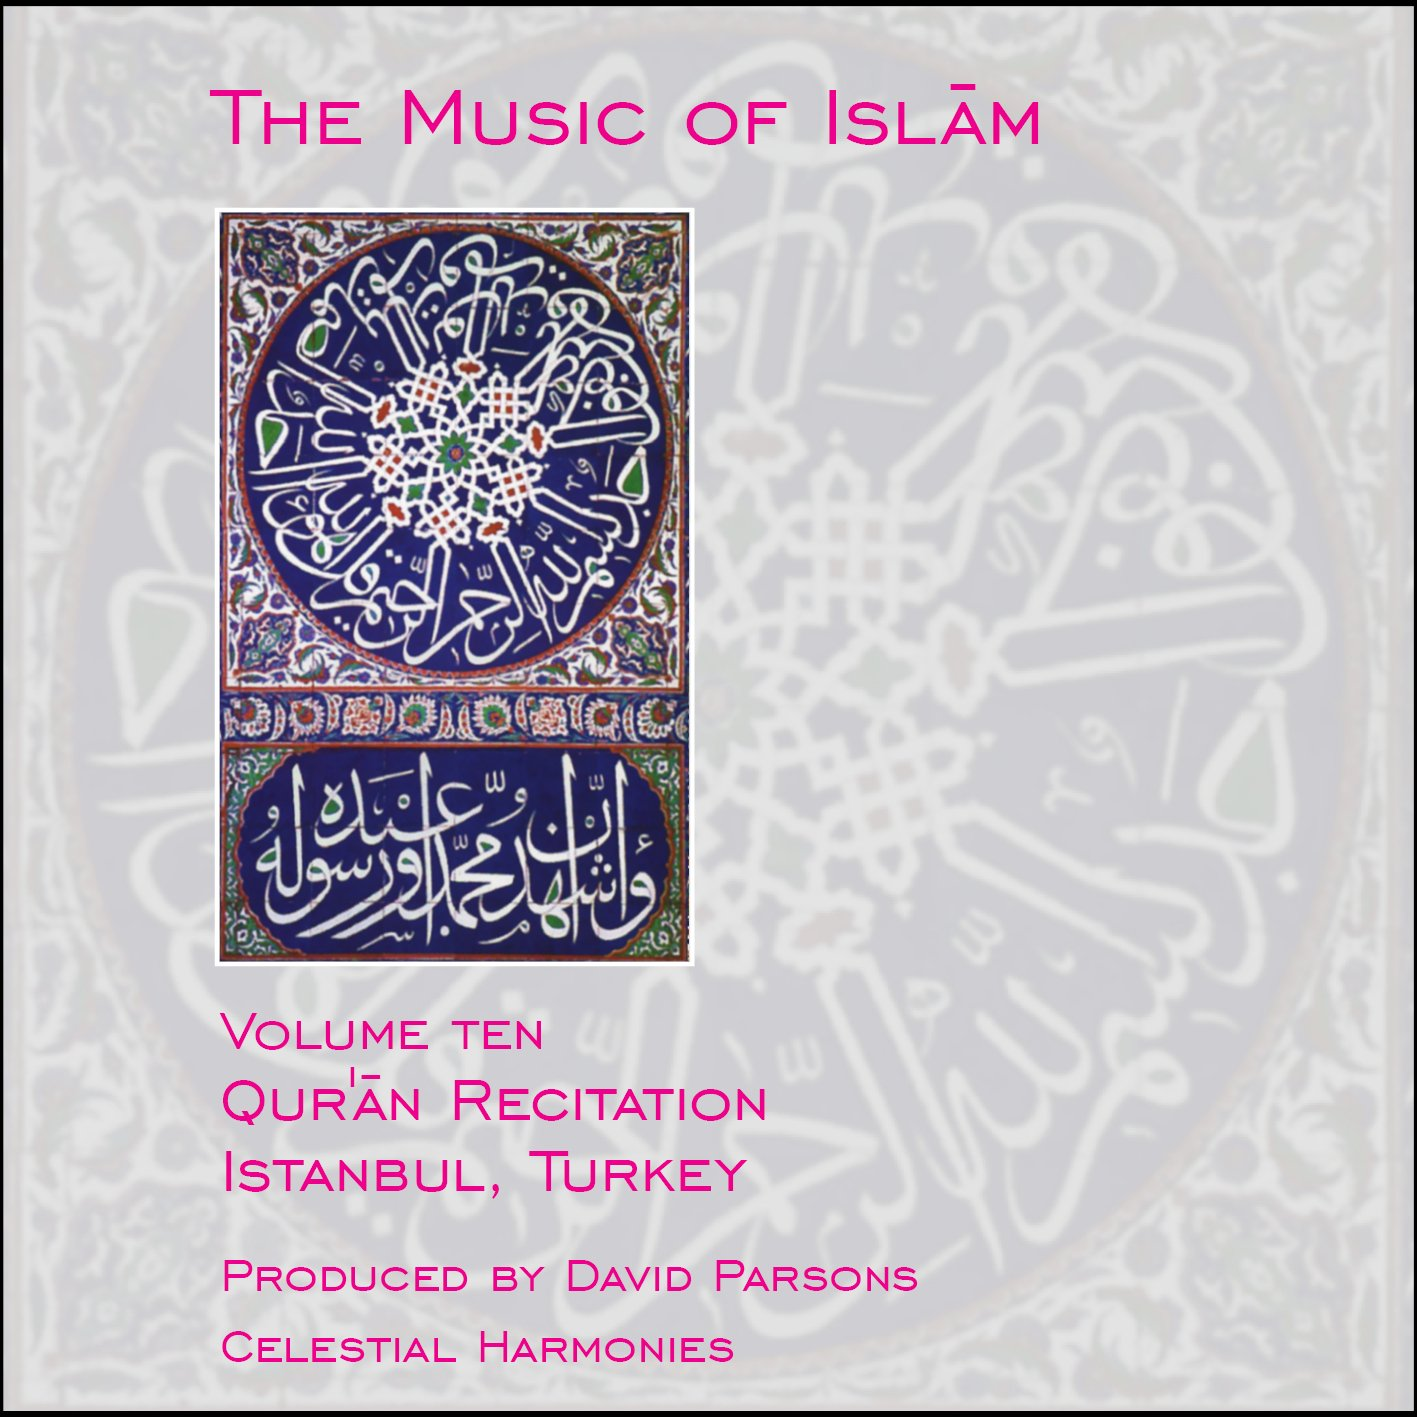 The Music of Islam, Vol. 10: Qur'an Recitation, Istanbul, Turkey by Celestial Harmonies